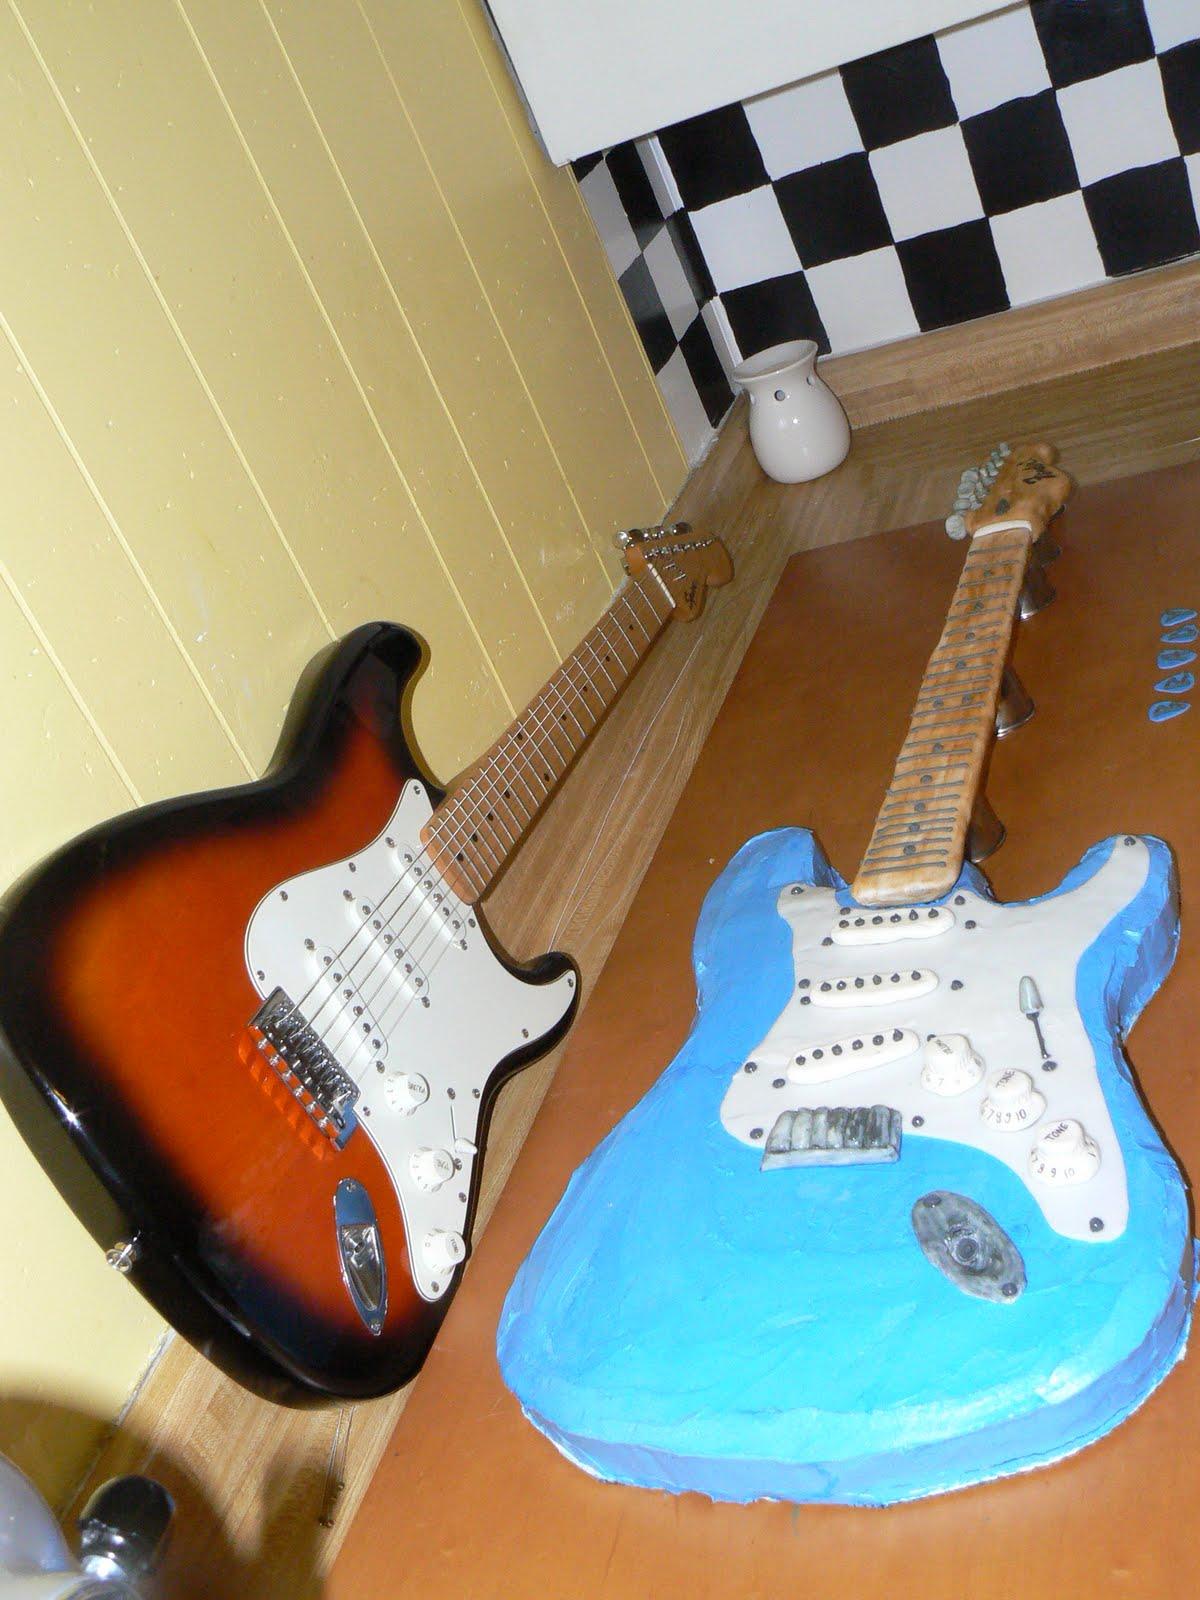 Bake Lore The Fender Stratocaster Of Cake